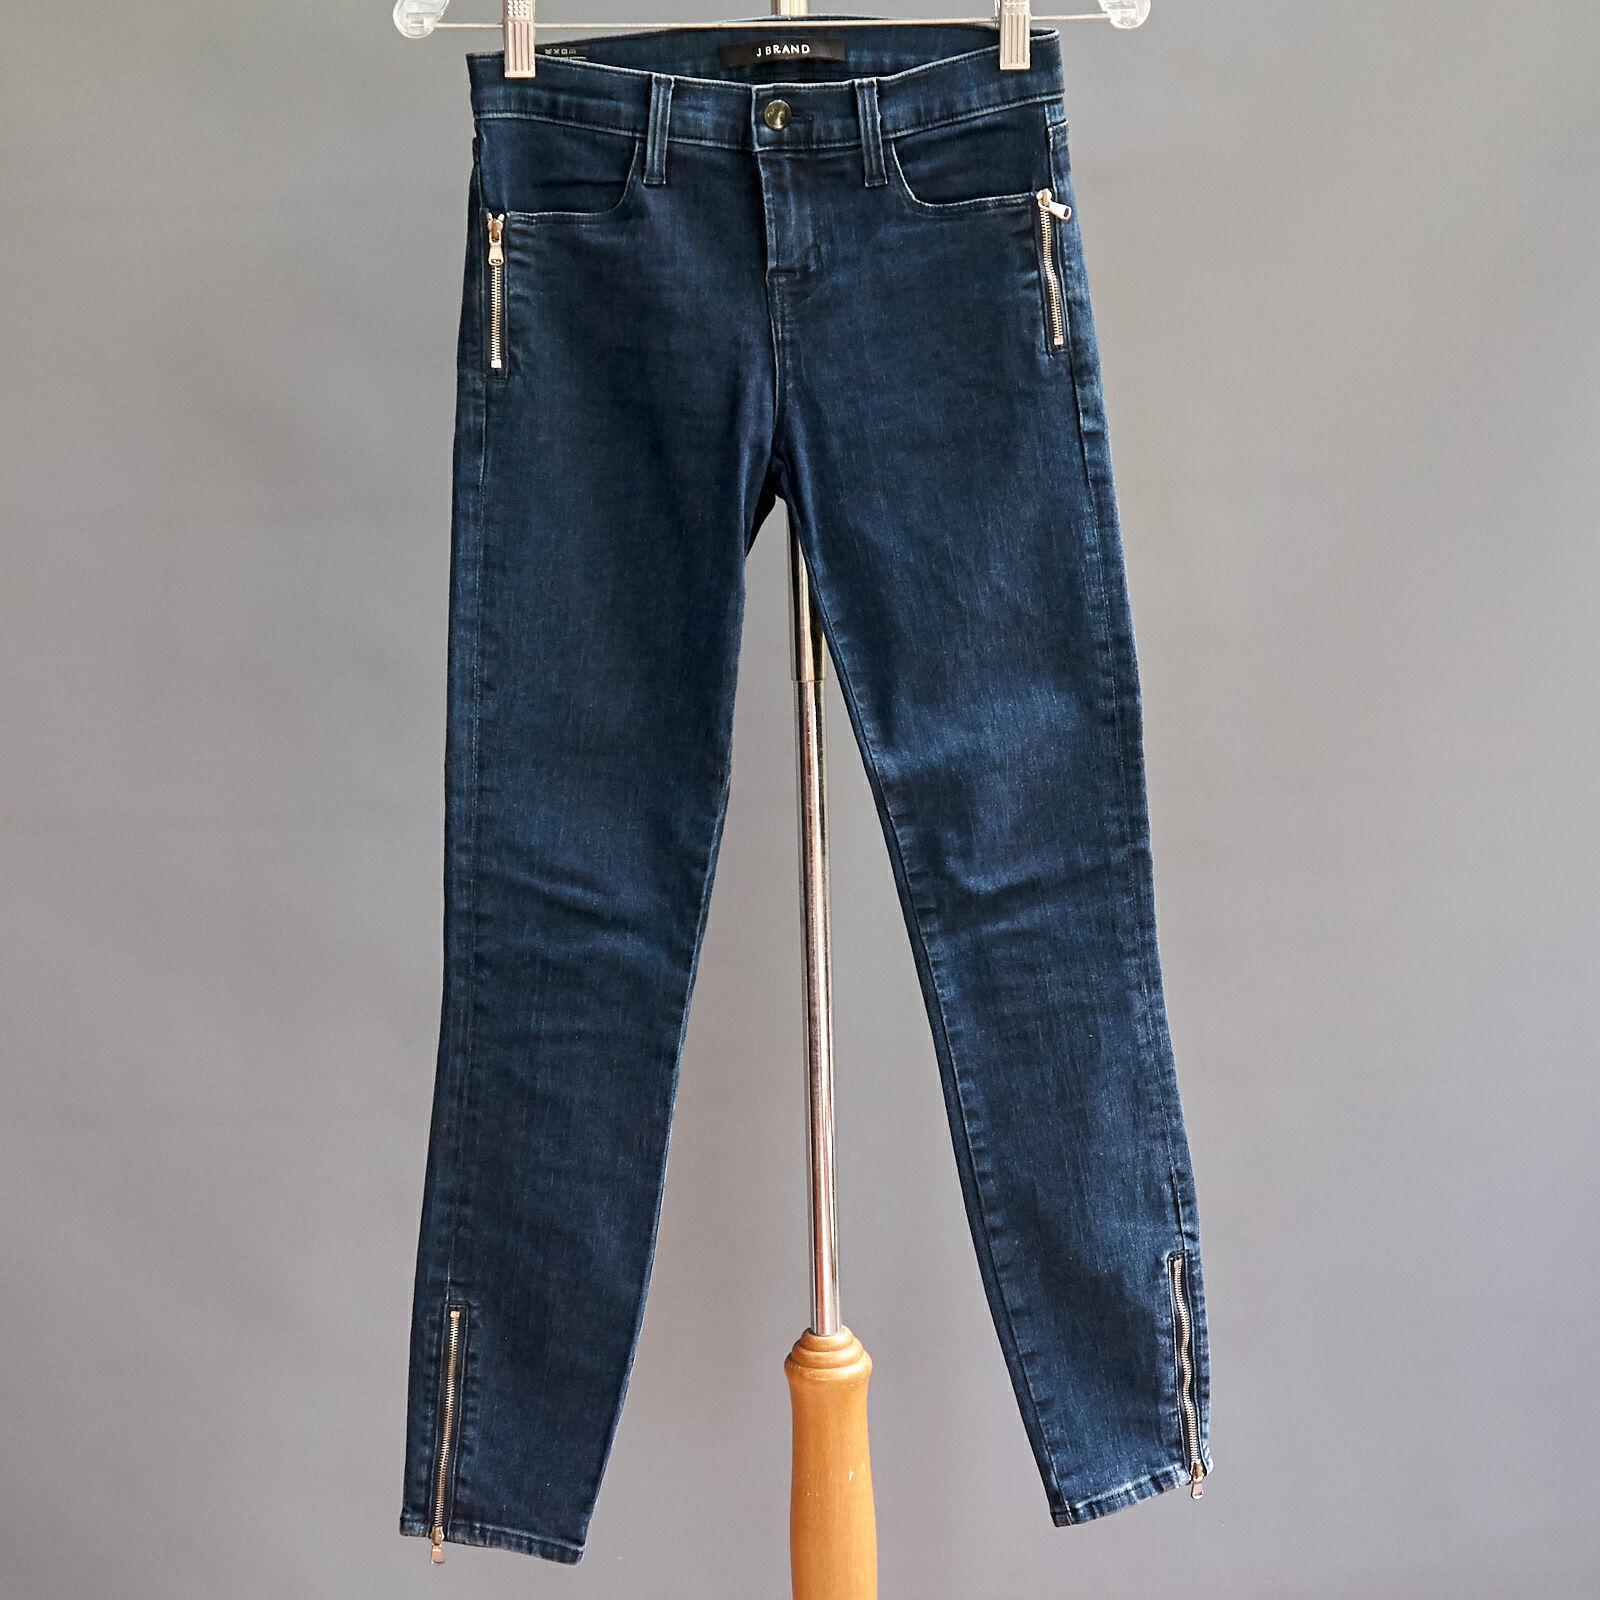 Baumwolle Elasthan 44) (DE 44 Gr. Denim Hose Damen Jeans J